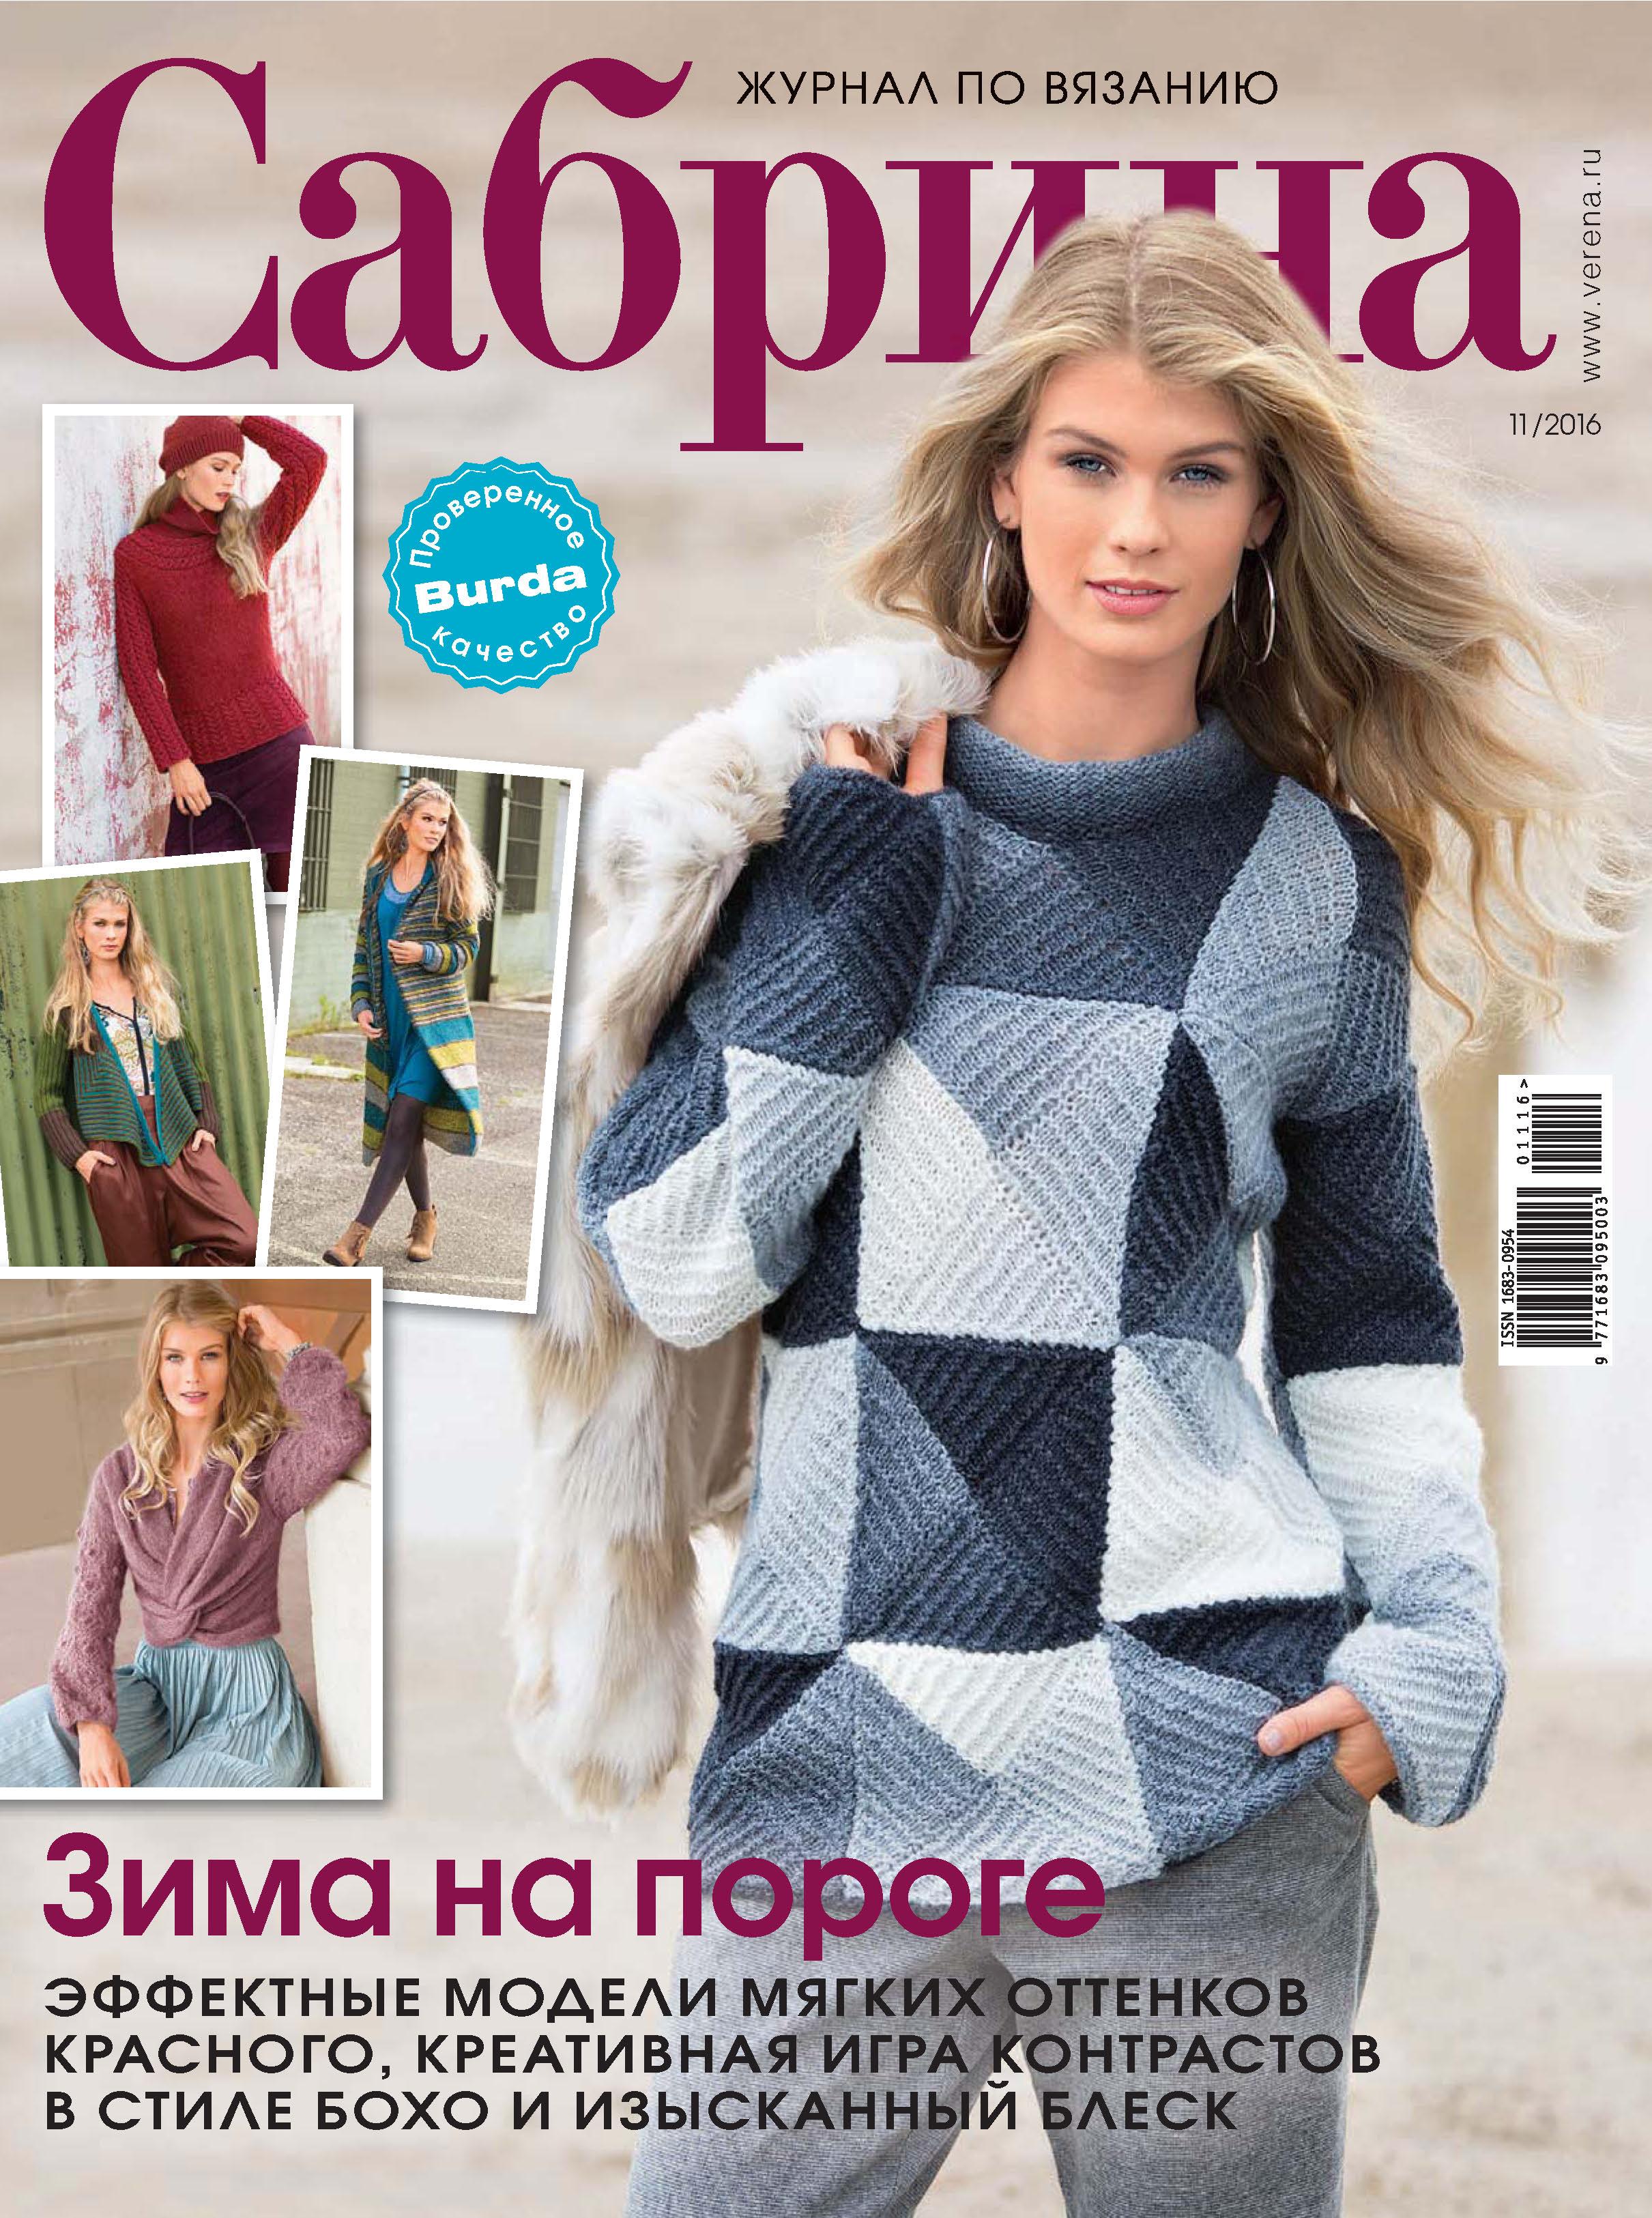 ИД «Бурда» Сабрина. Журнал по вязанию. №11/2016